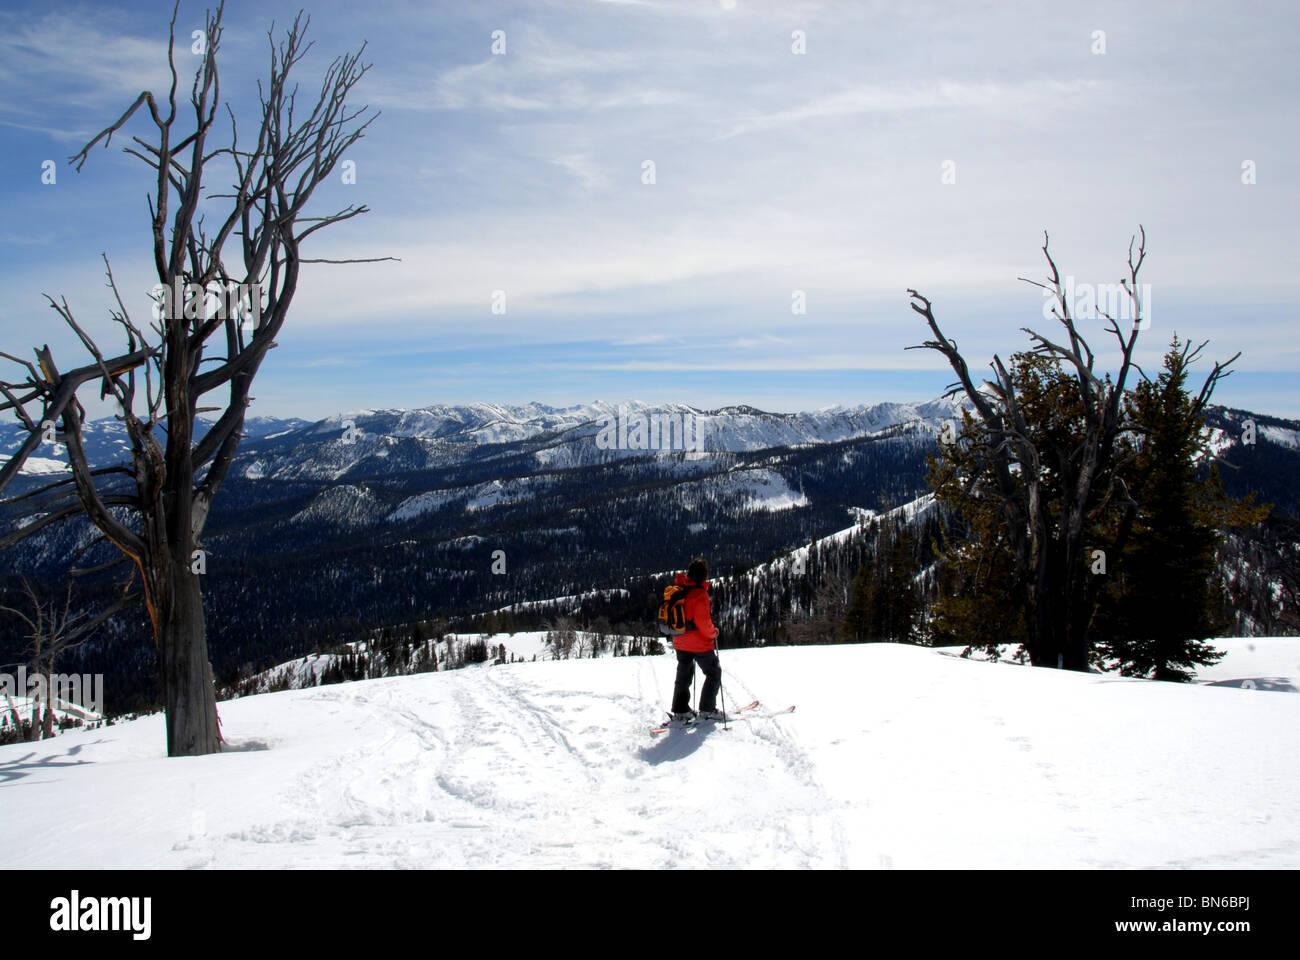 Skier on summit of unnamed mountain above Galena Pass, Sun Valley, Idaho. - Stock Image